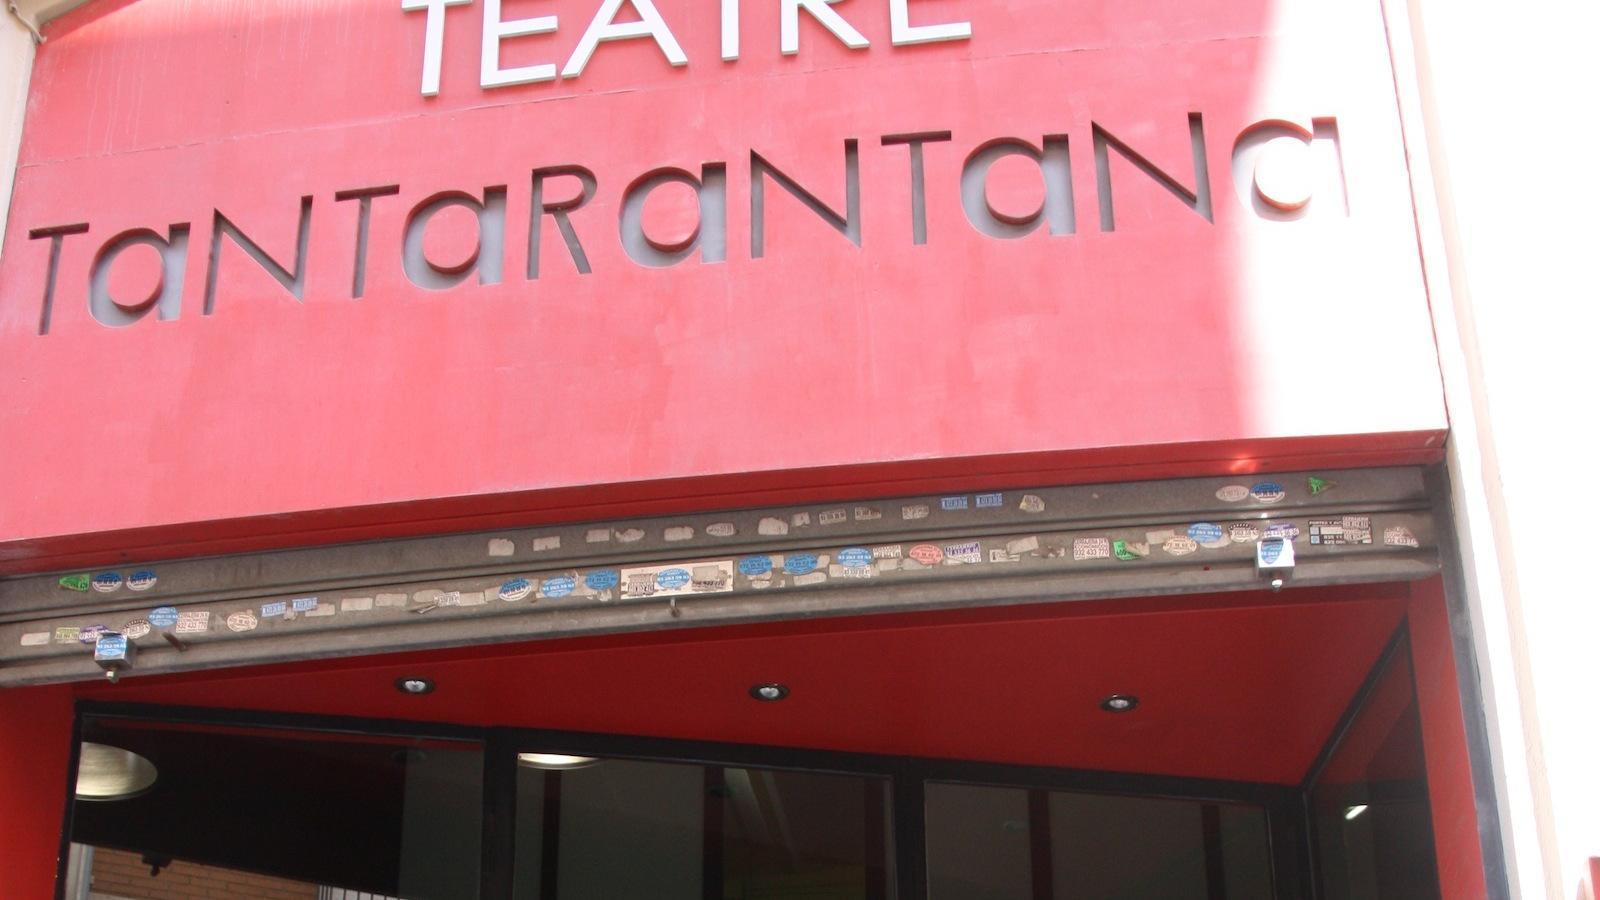 Resultado de imagen de teatre tantarantana barcelona